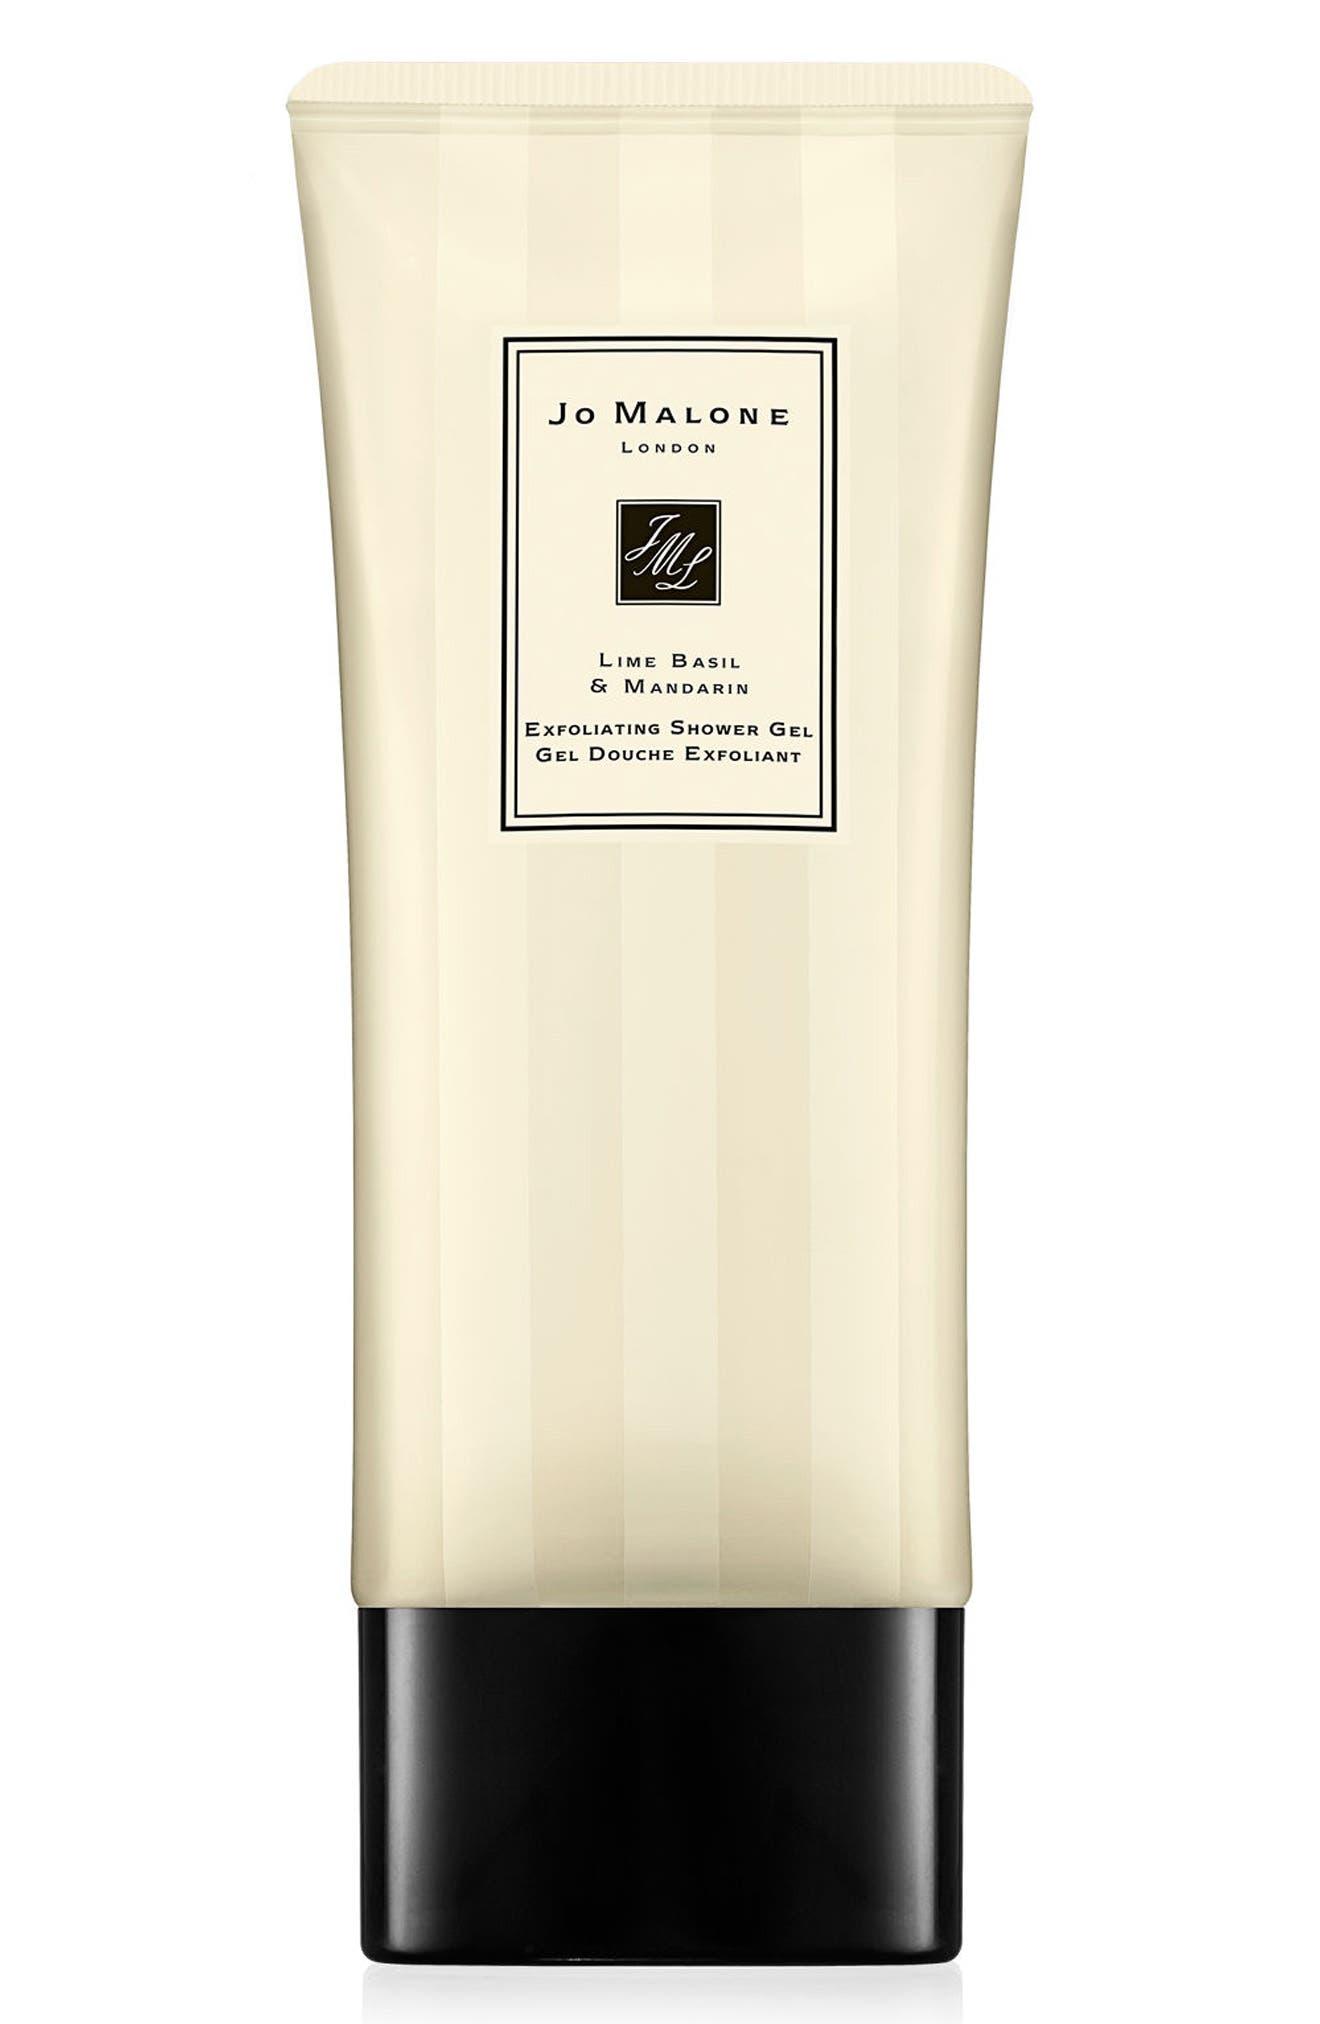 Jo Malone London™ Lime Basil & Mandarin Exfoliating Shower Gel